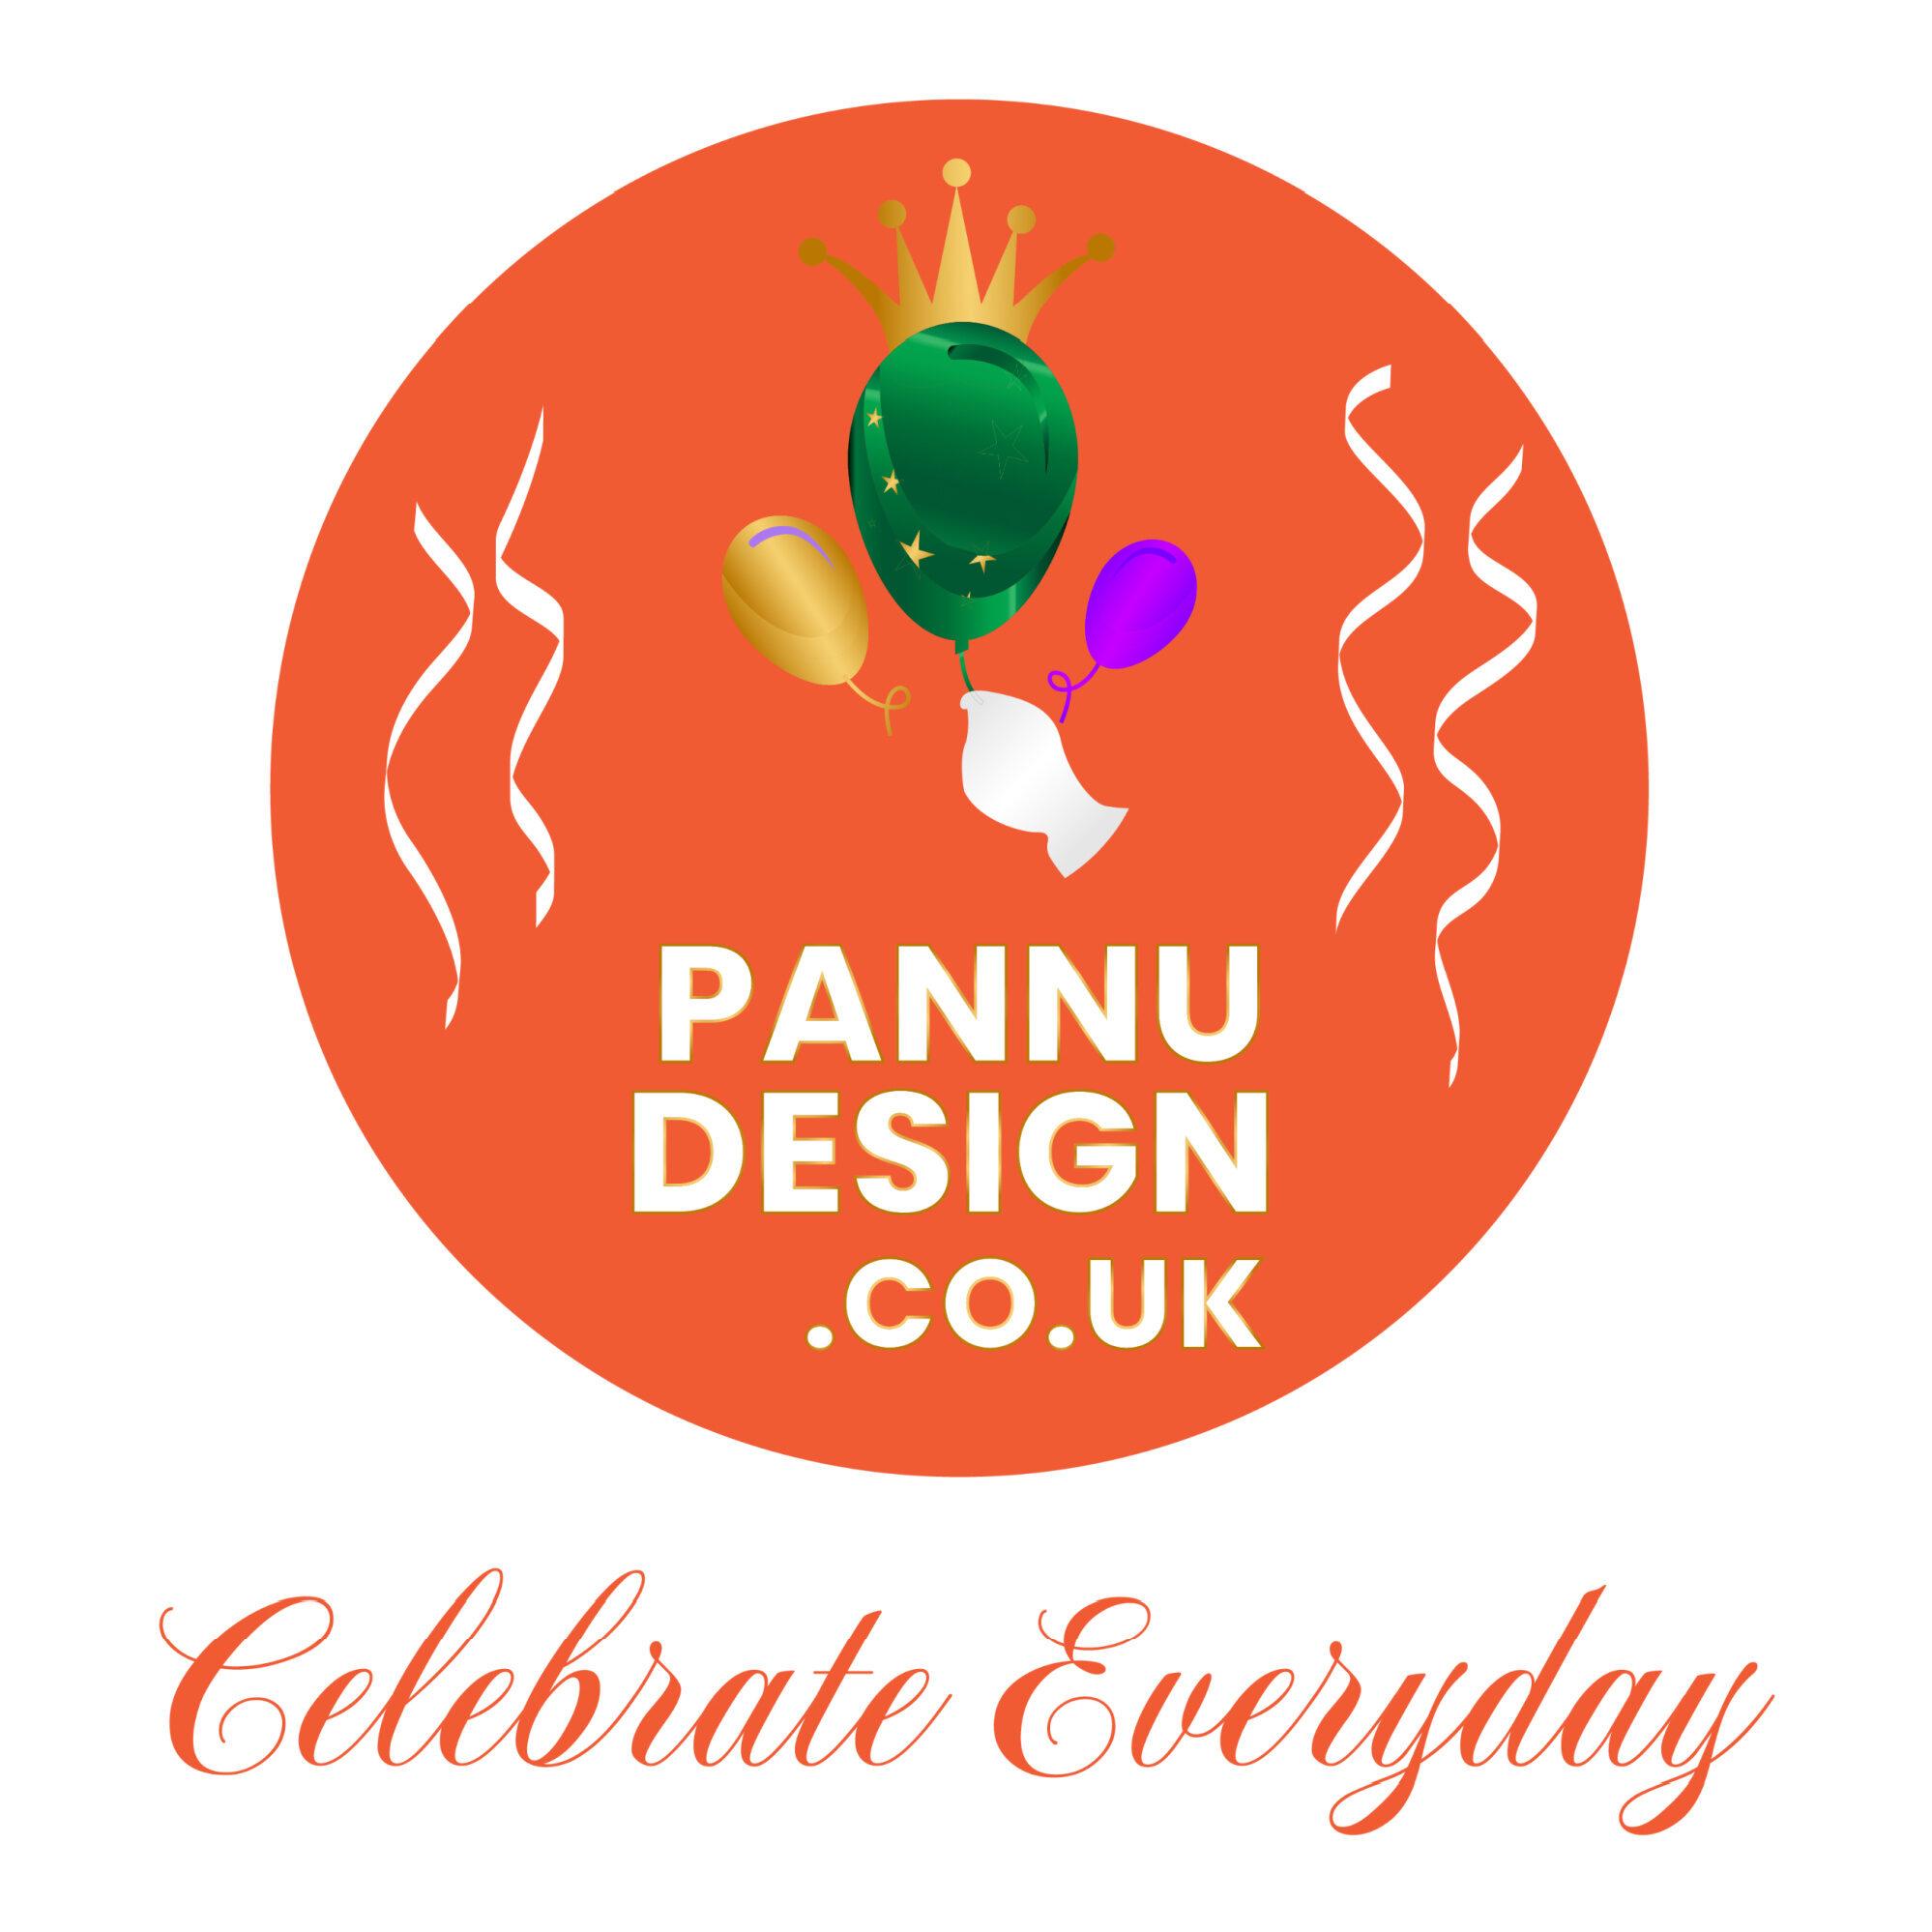 Pannu Design